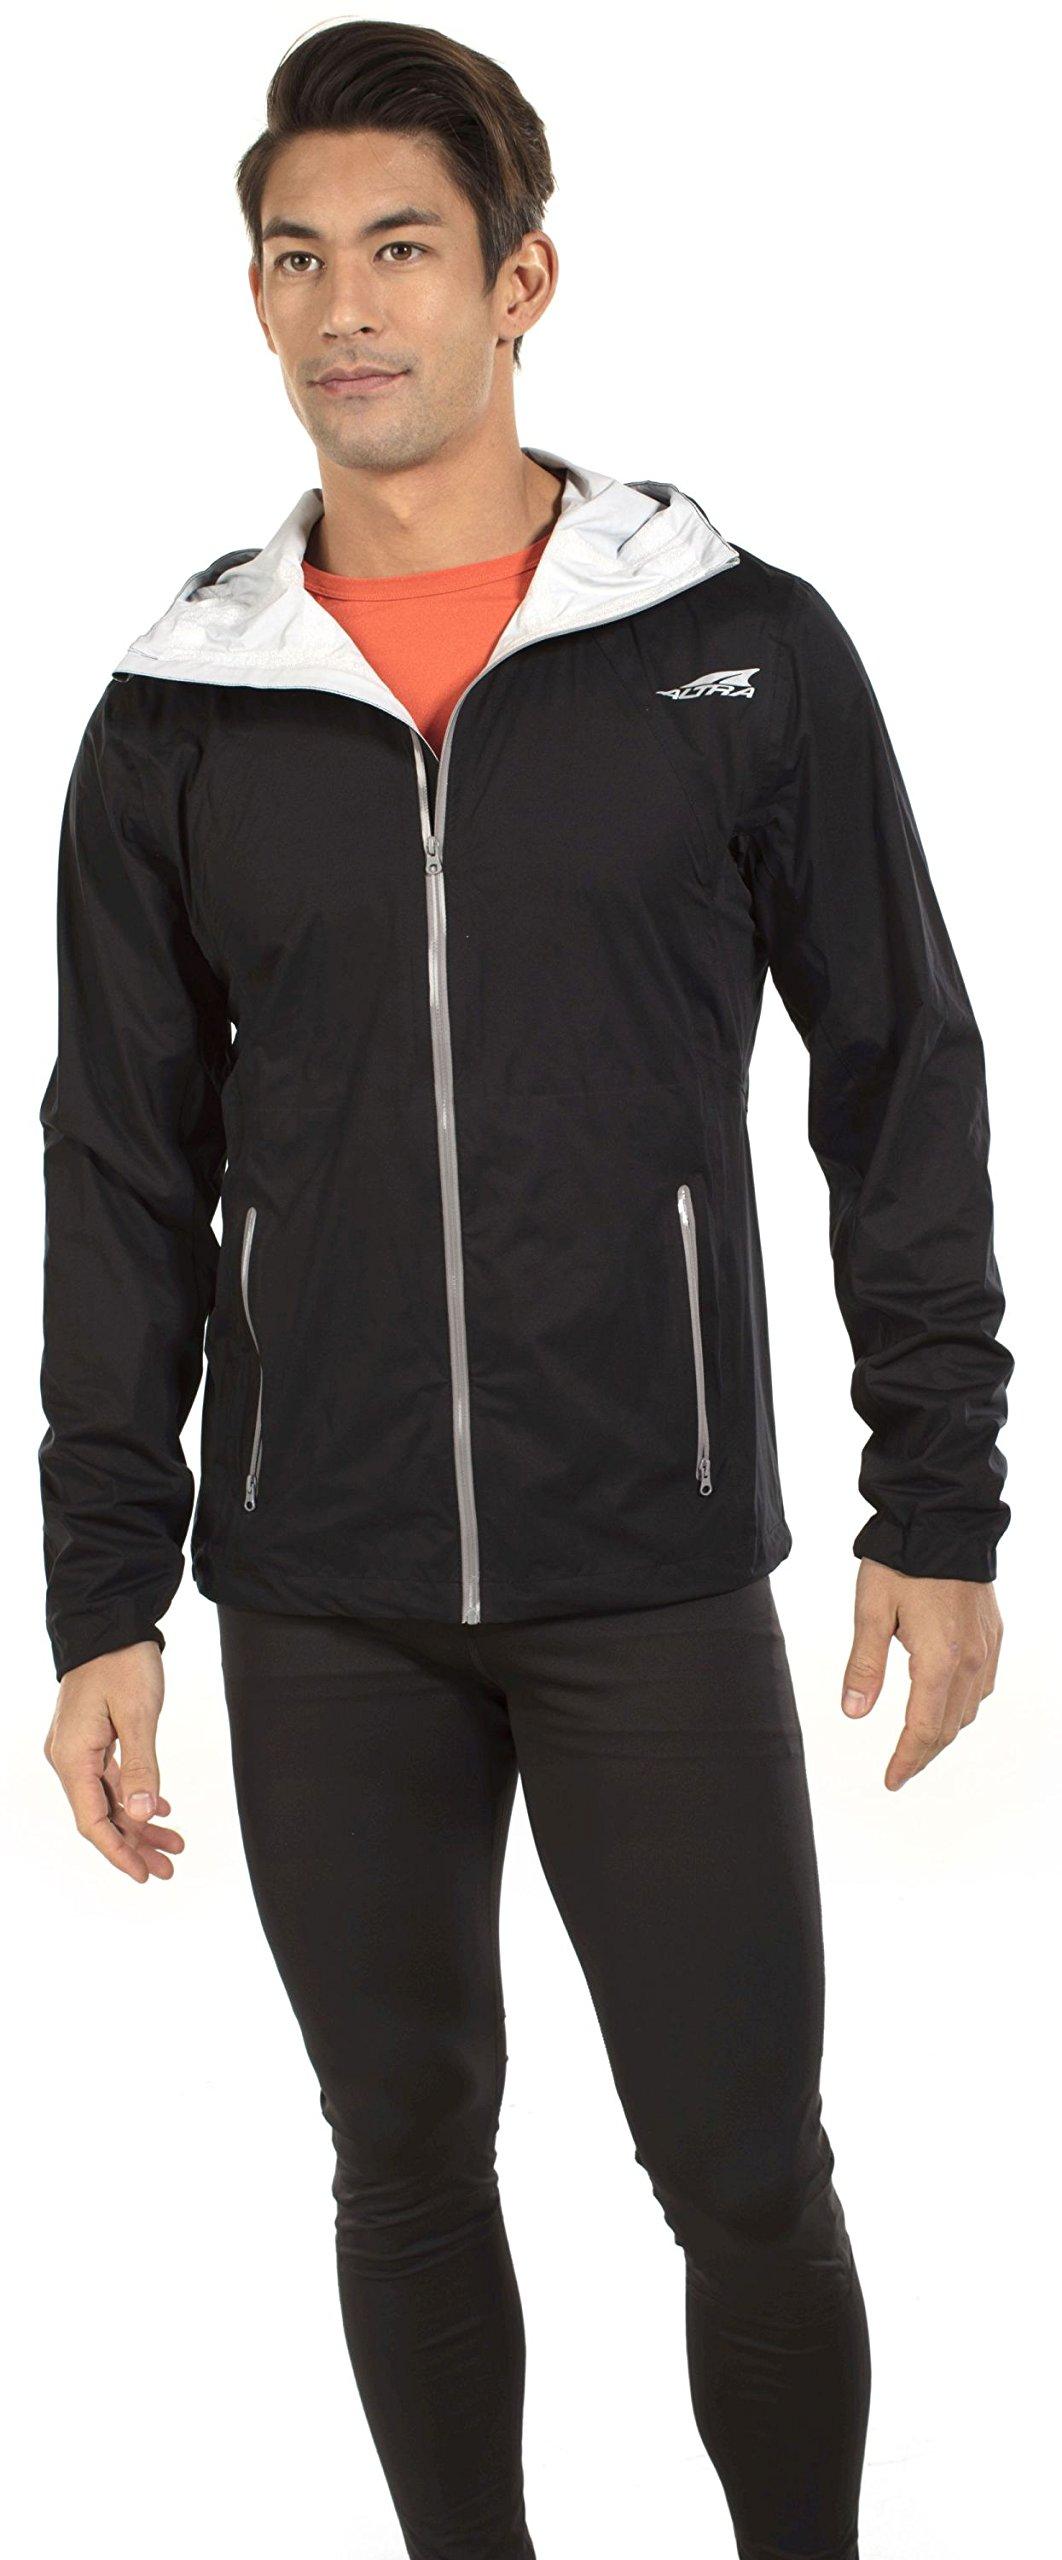 Altra Wasatch Jacket - Men's Black Large